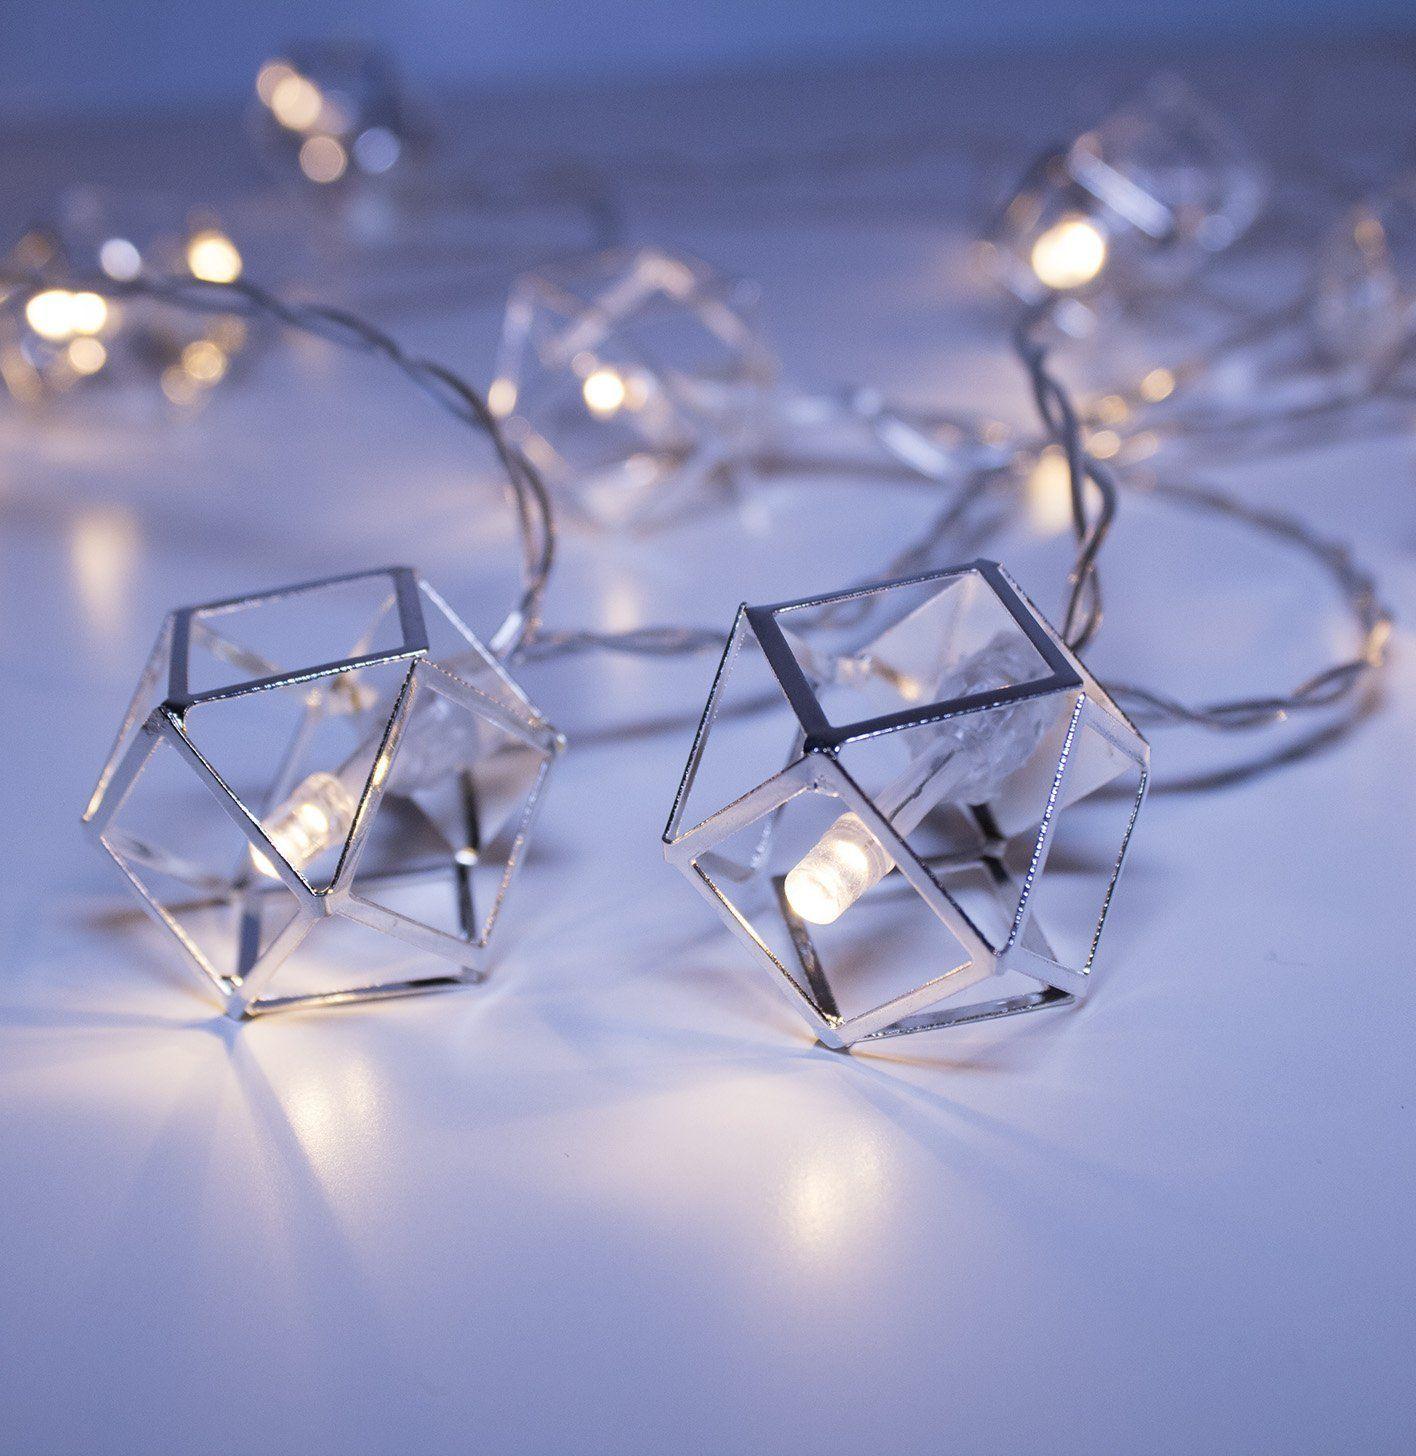 Led-lichterketten luxlumi geosilver pendant string lights batteries included with